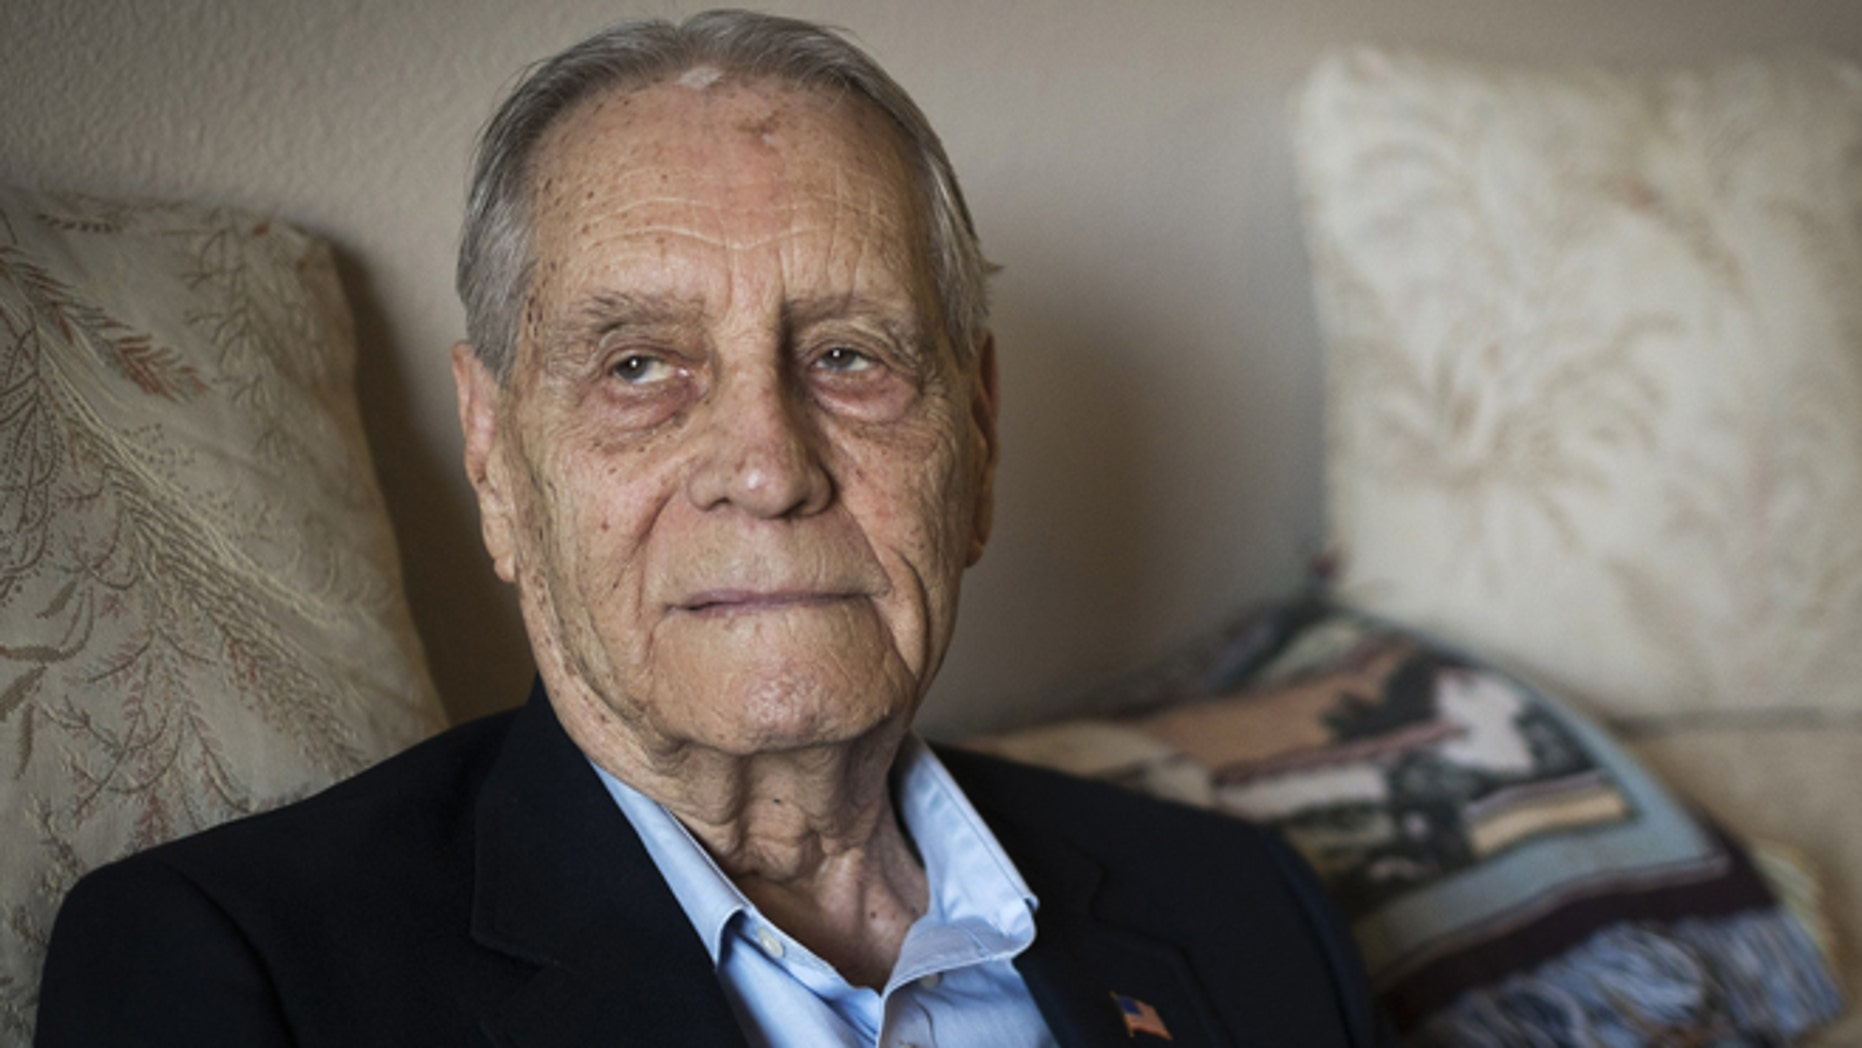 July 16, 2015: James Murphy, World War II veteran and prisoner of war, is photographed at his home in Santa Maria, Calif.